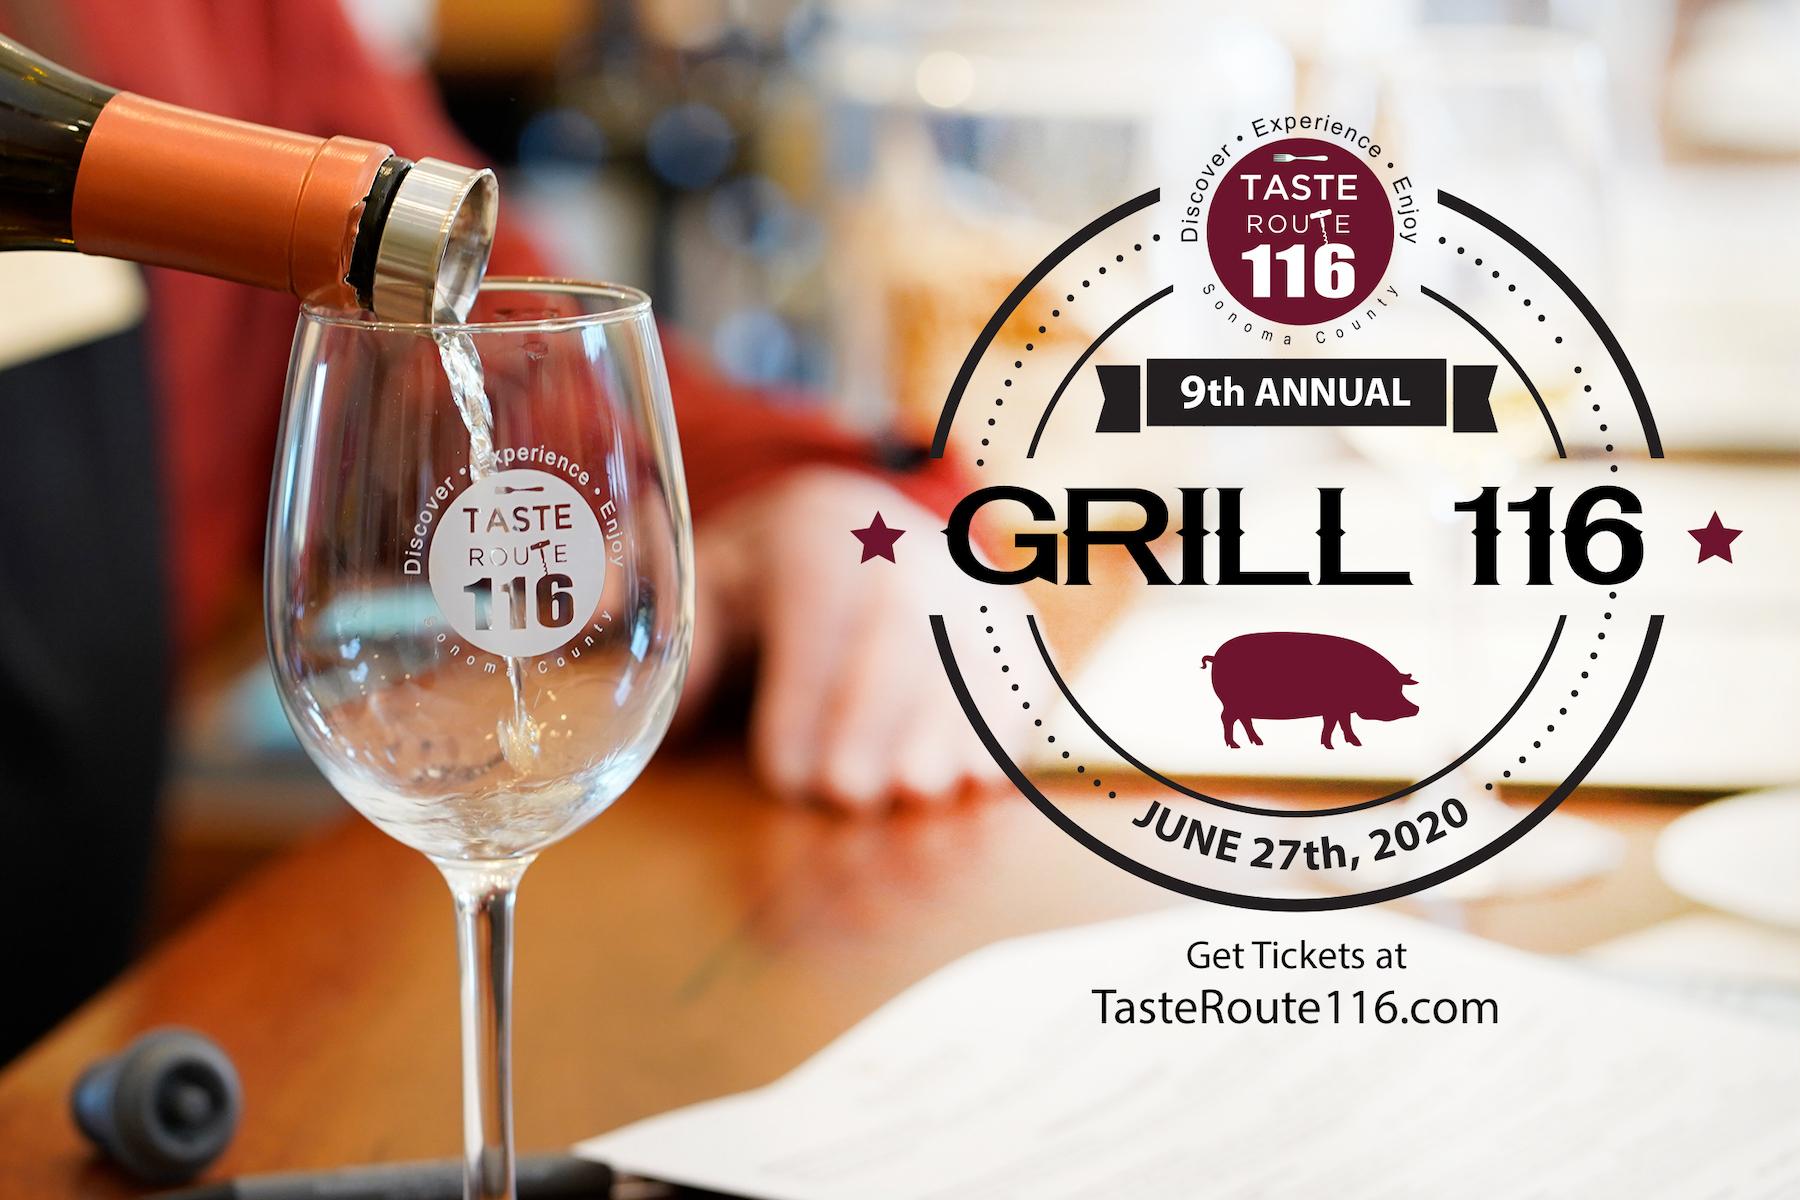 9th Annual Grill 116